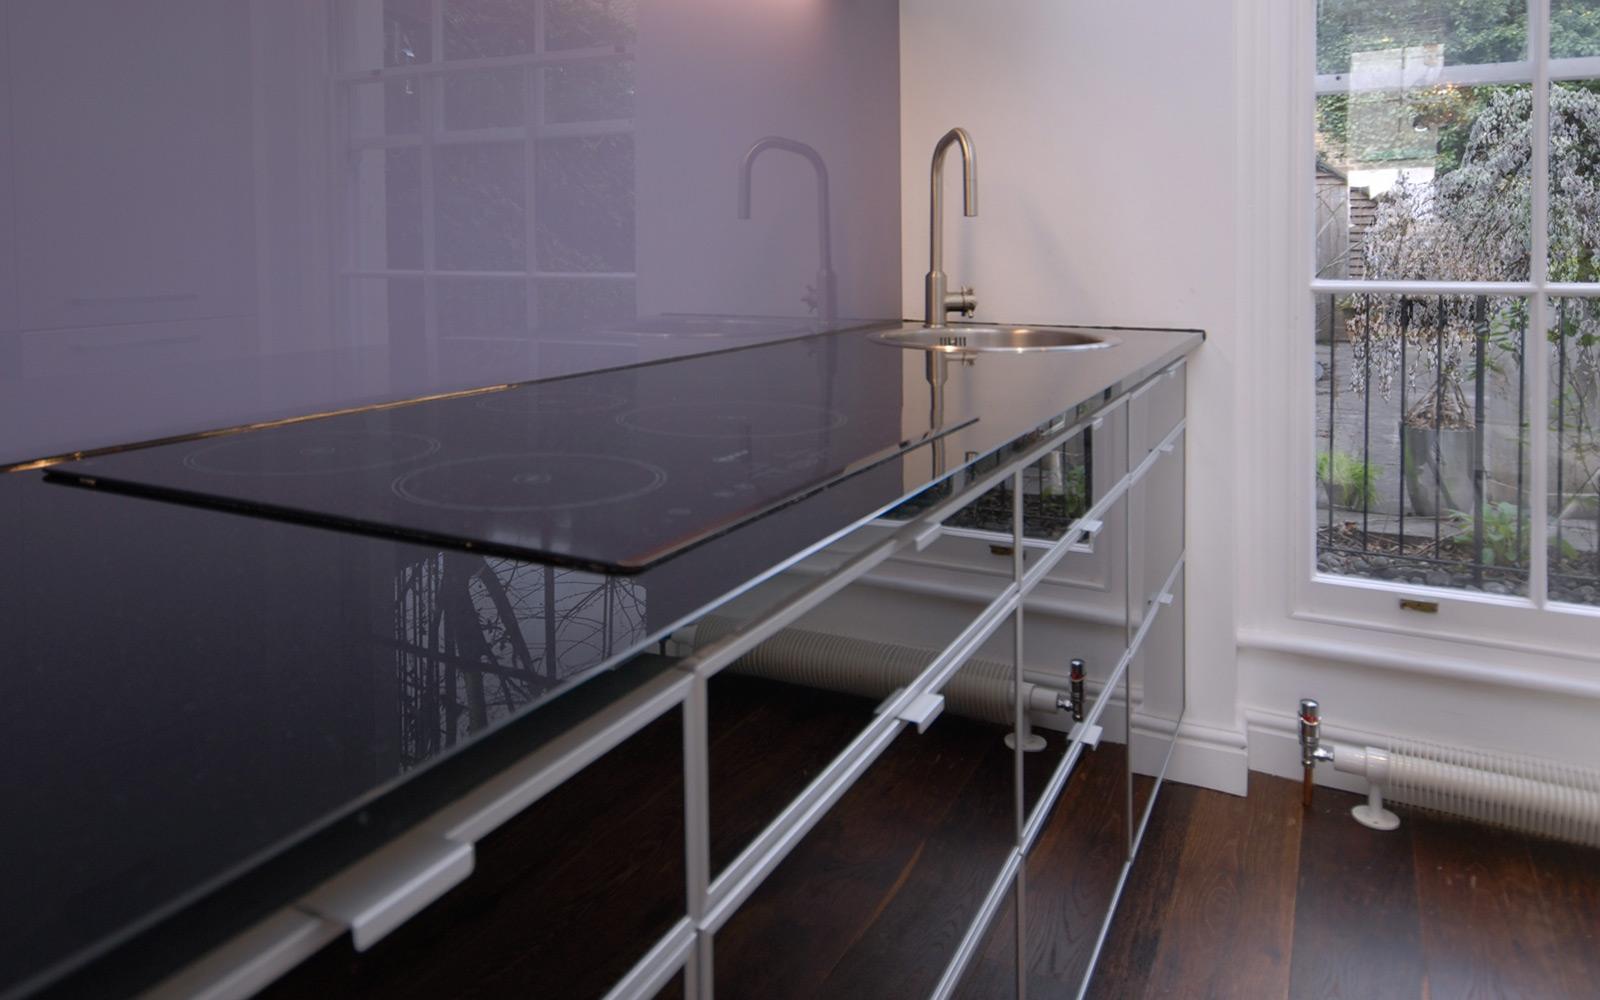 kitchen design with glass